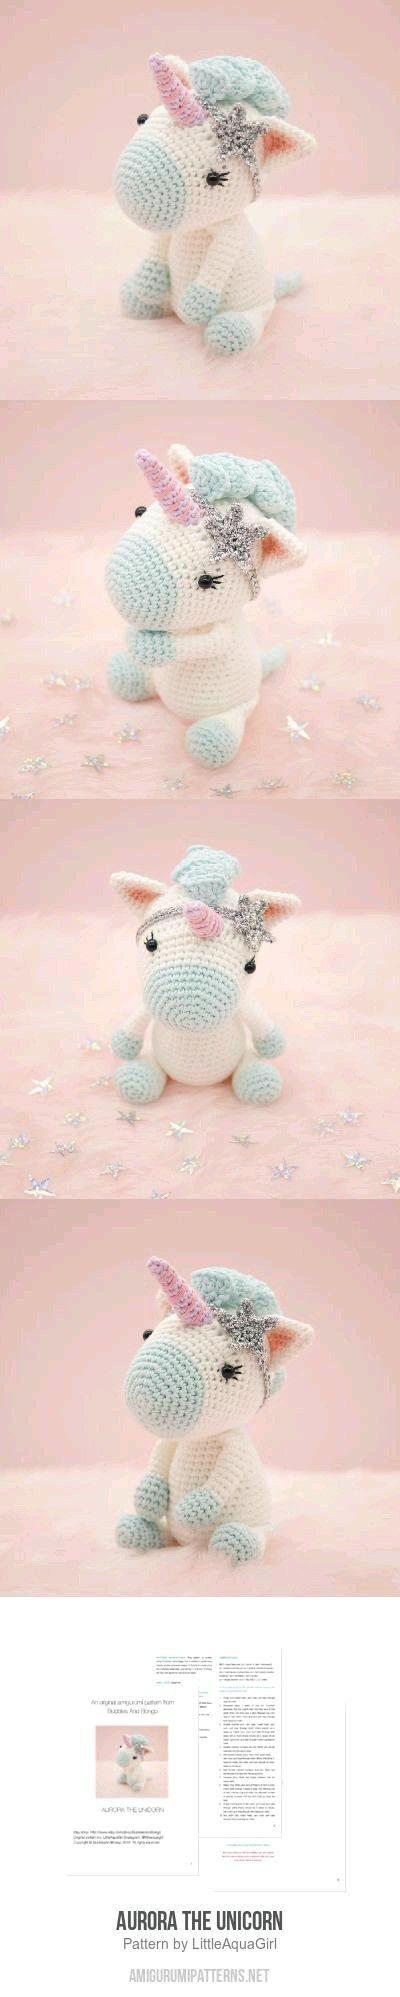 Une petite deco cute qui embellira la chambre d une petite fille